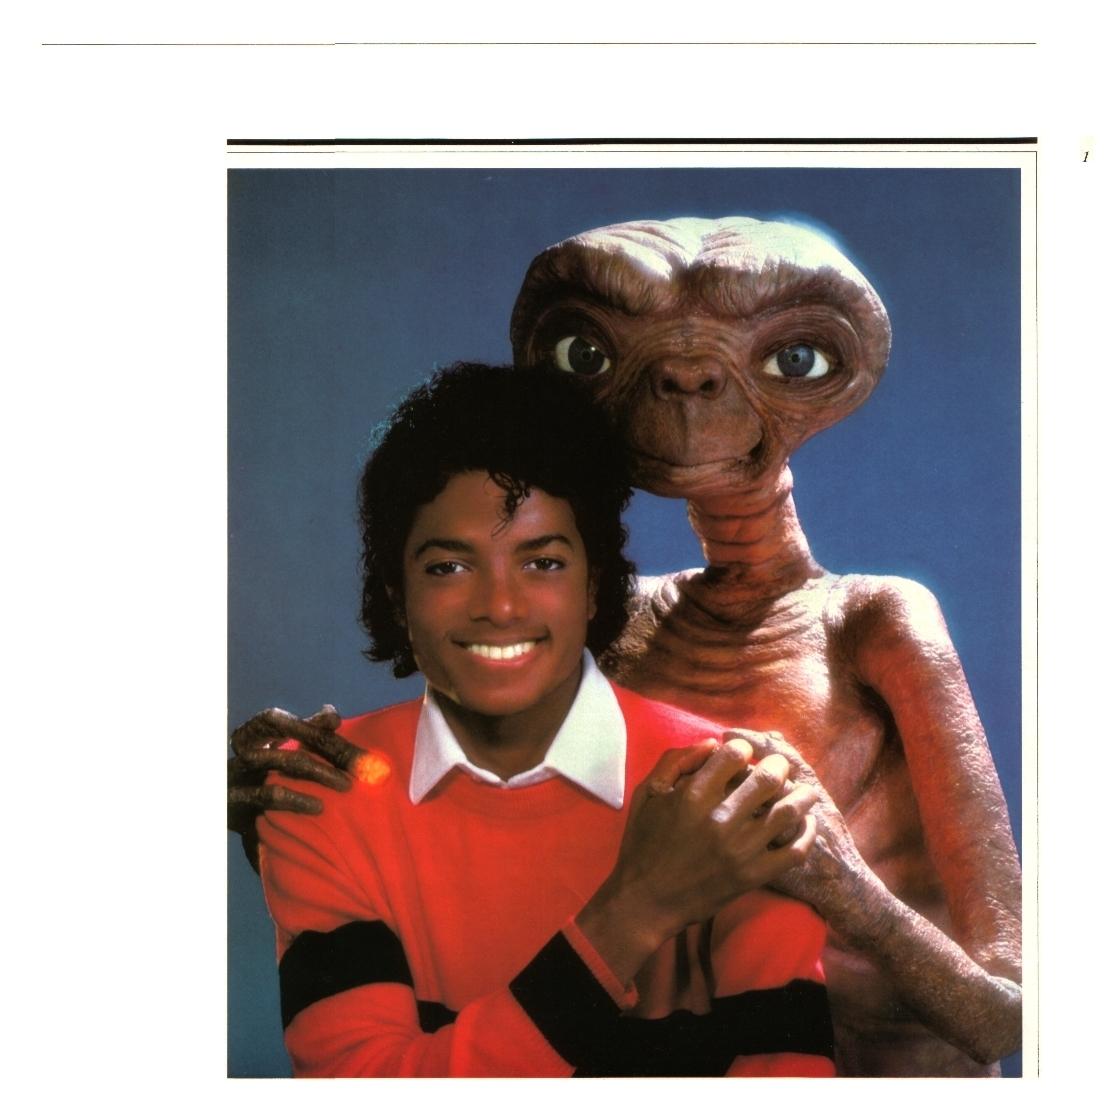 Thriller-Era-michael-jackson-7917282-1114-1114.jpg